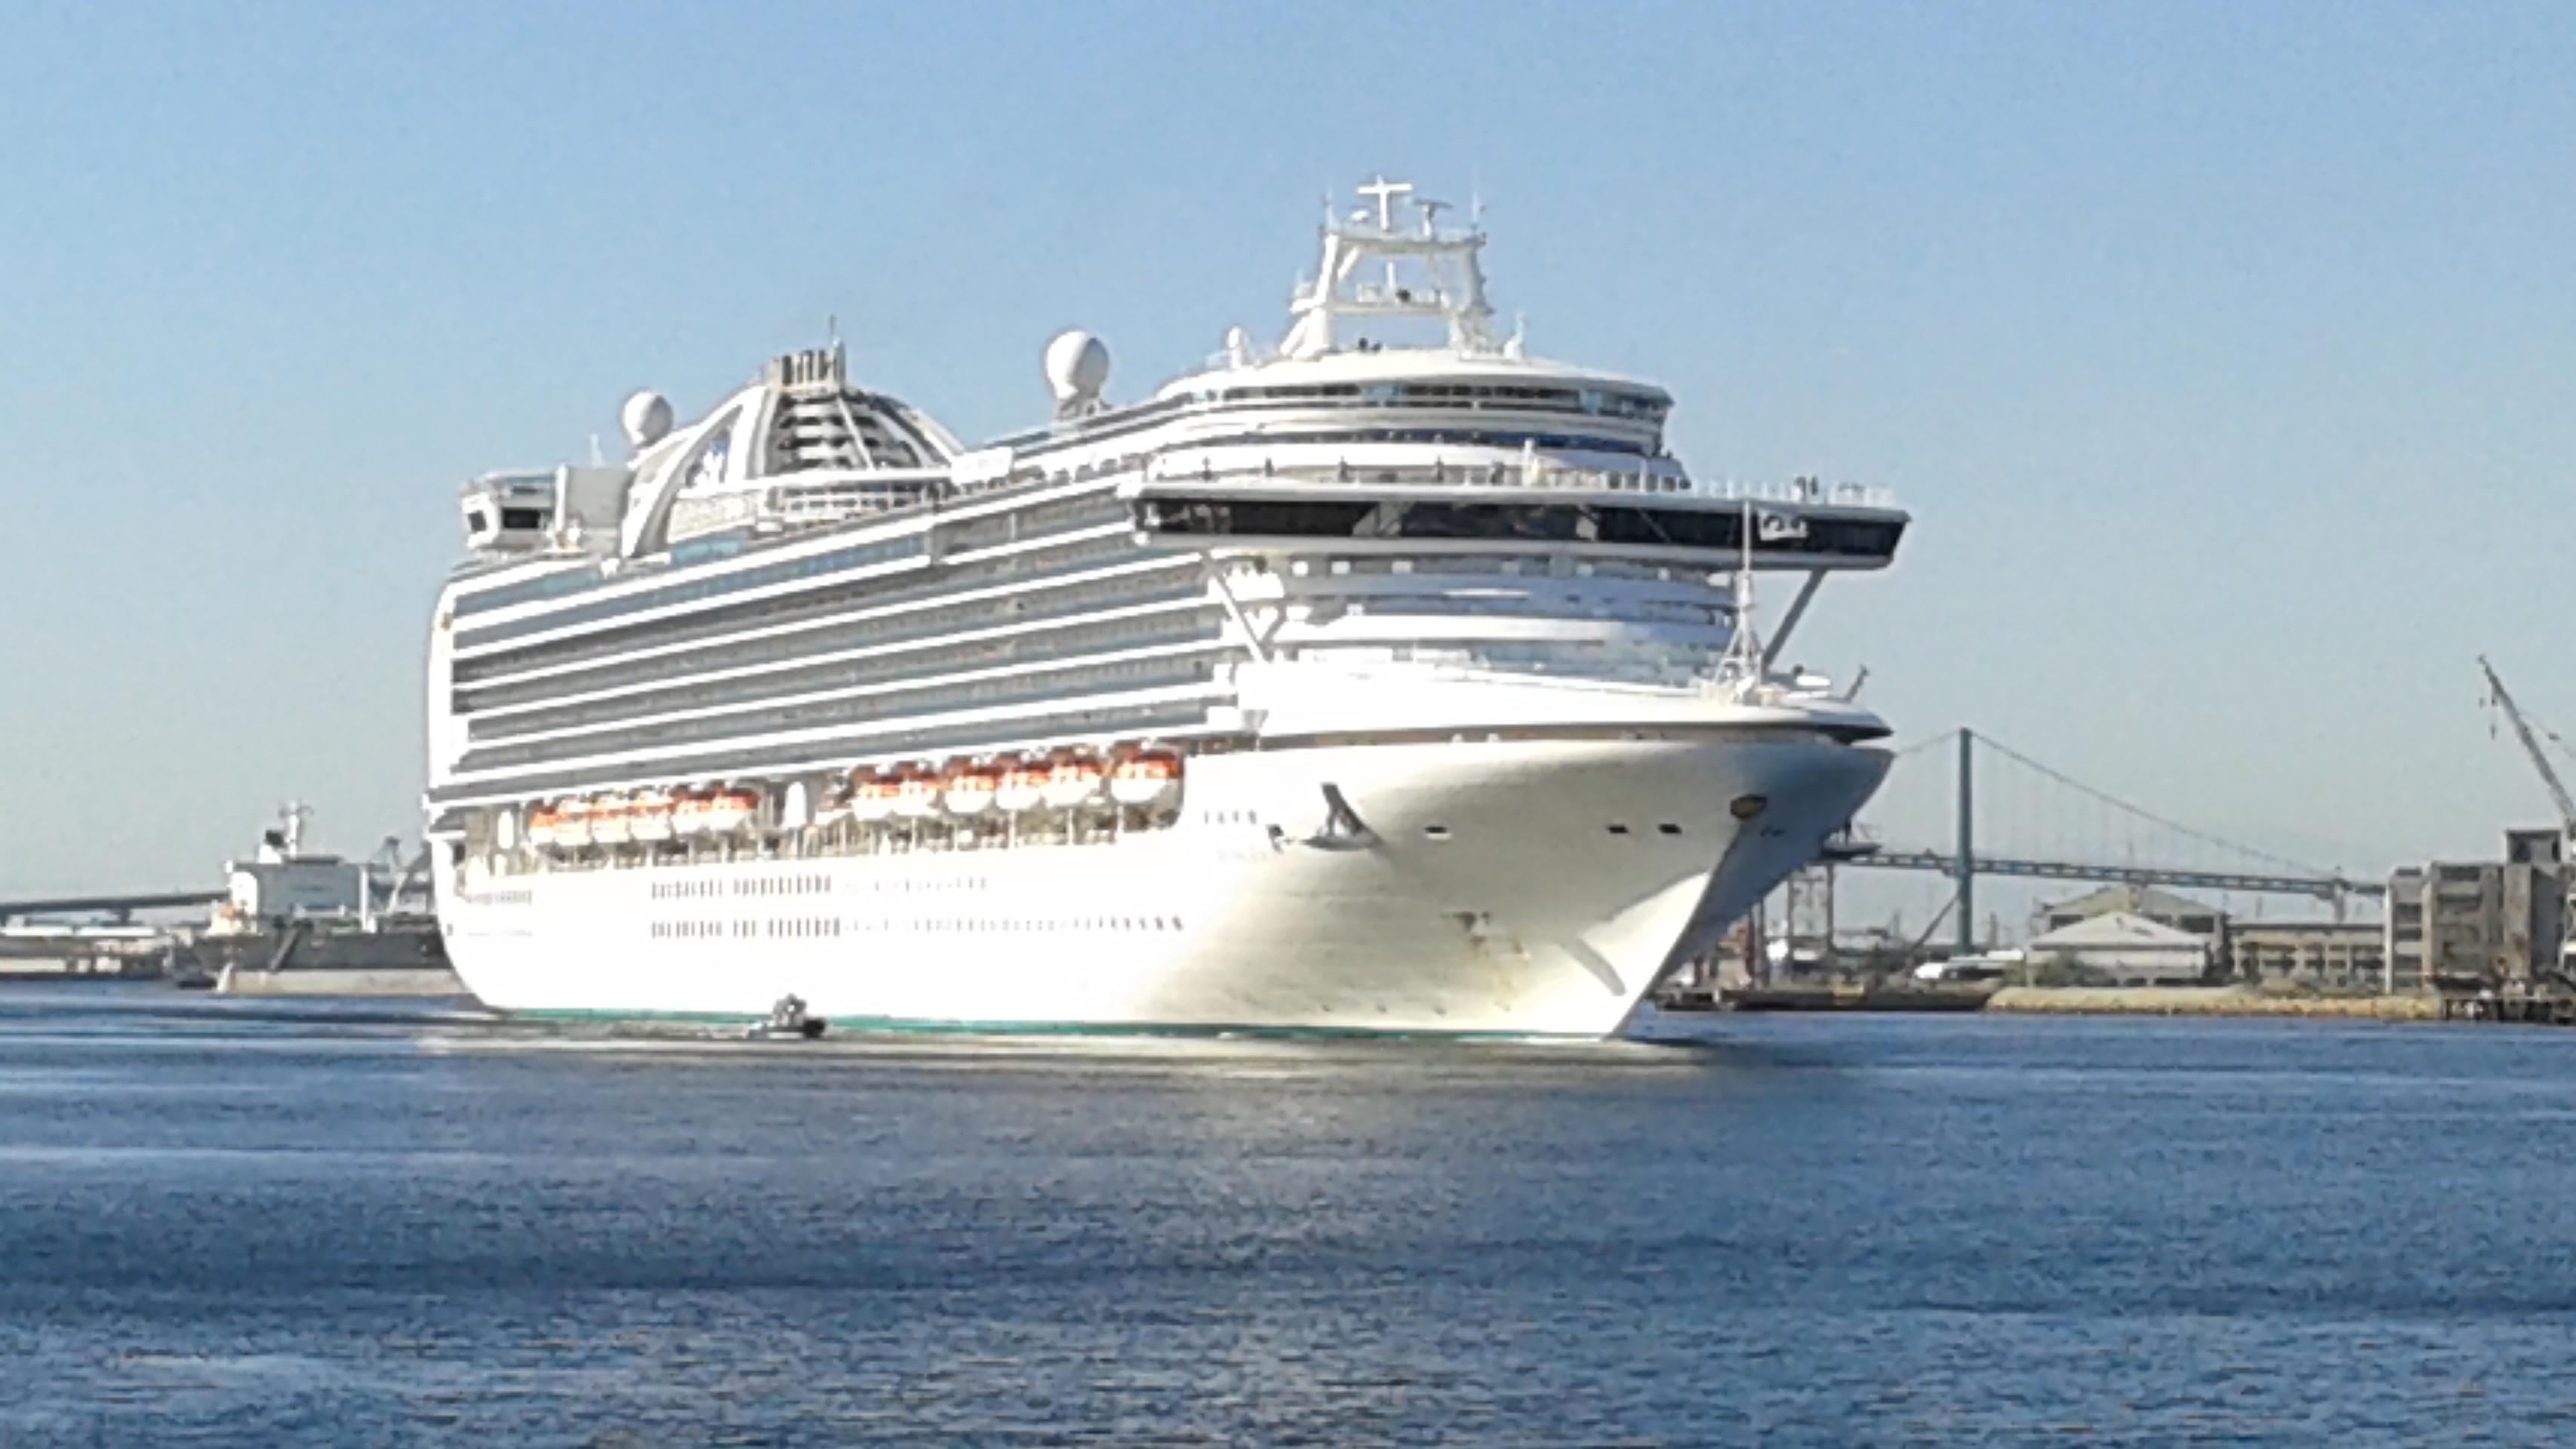 Ruby Princess Port Of Los Angeles San Pedro Calendar - Cruise ships los angeles